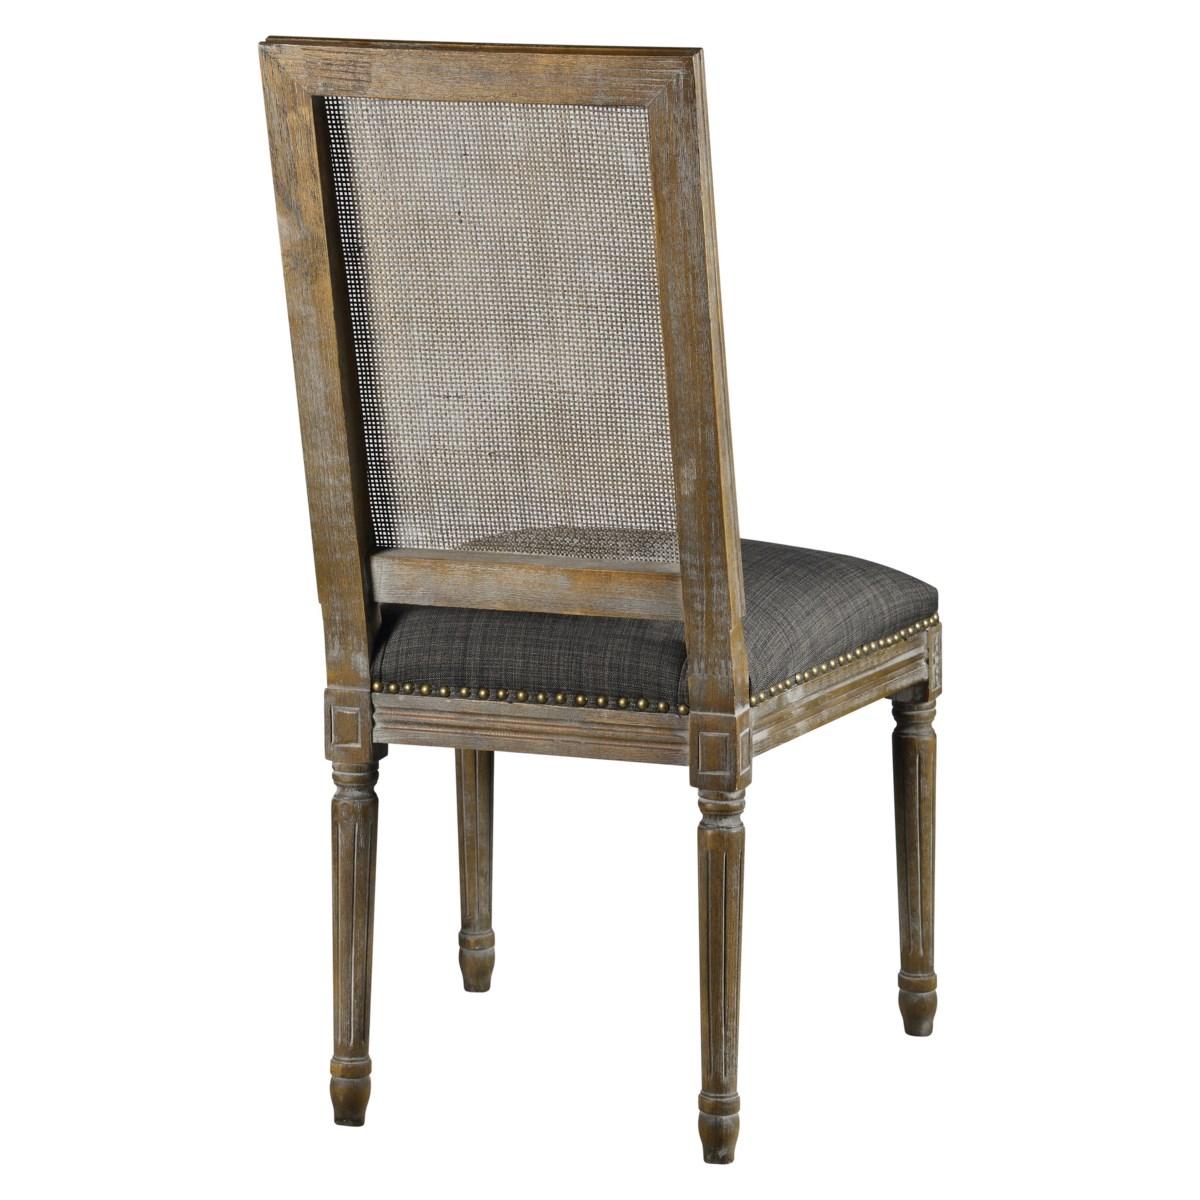 -Square Maxwell Side Chair W/ Cane(Urban Bark)